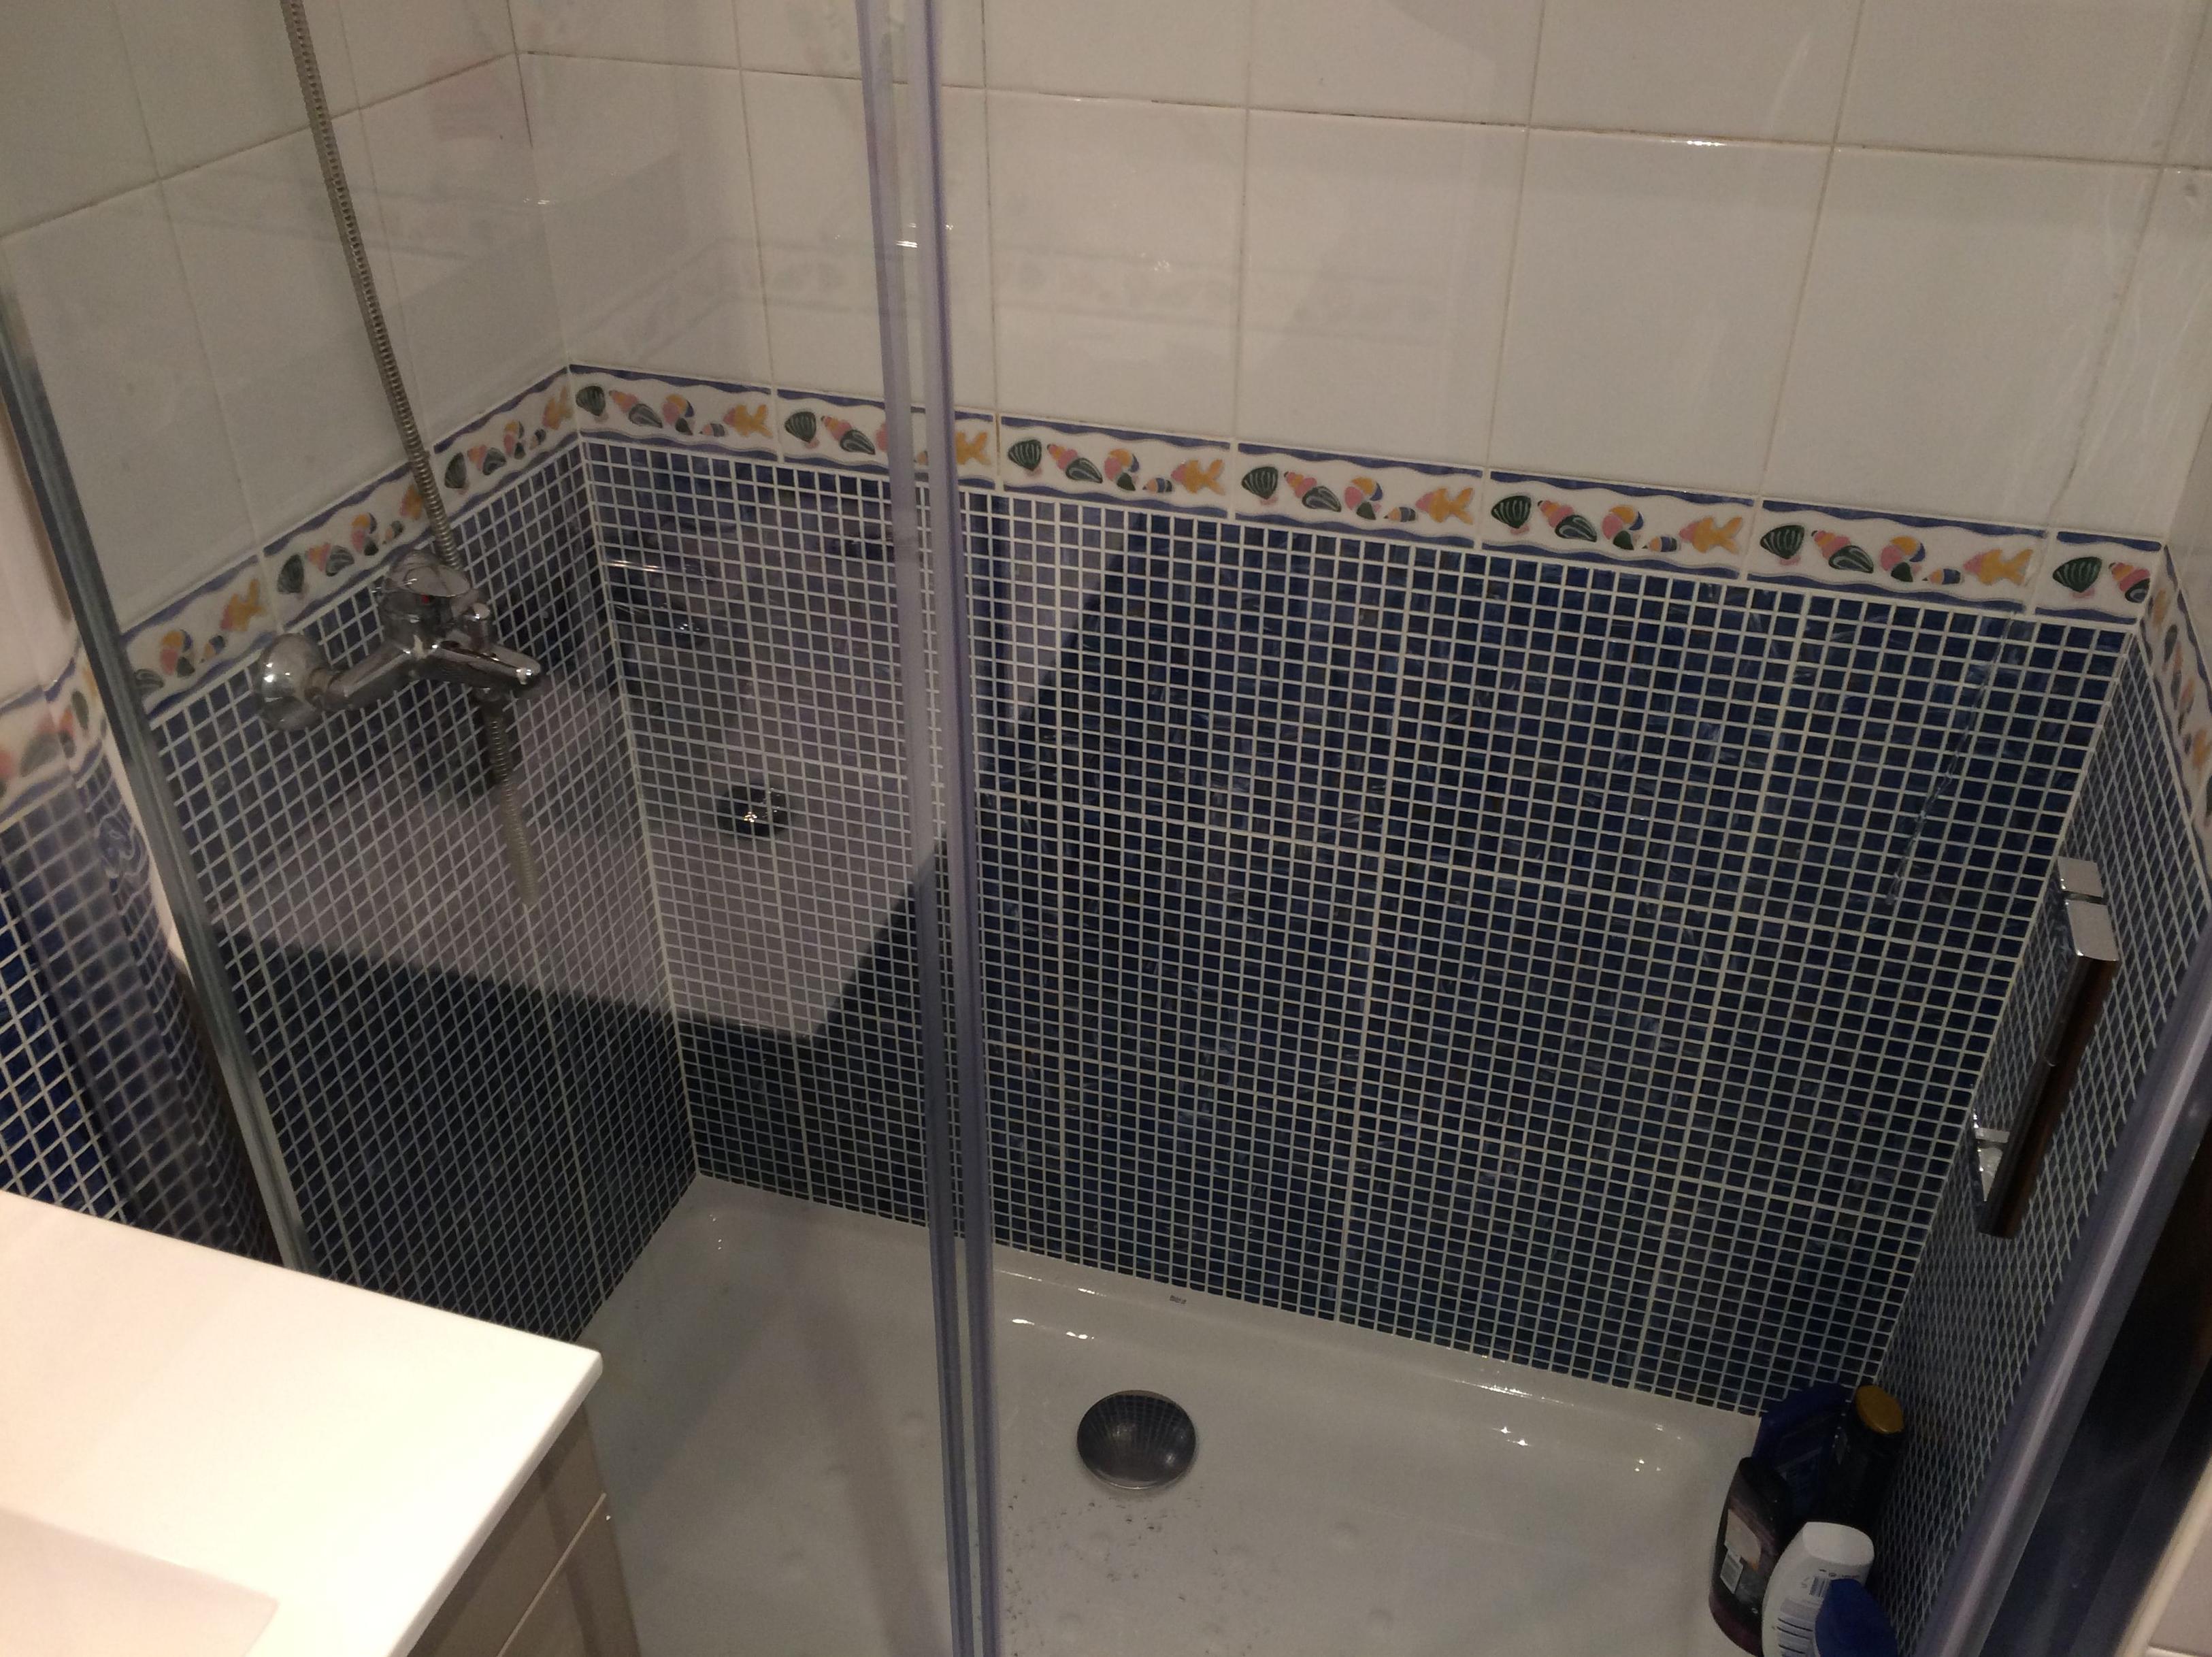 Cambio de bañera por plato de ducha \u002D mampara Torvisco modelo NIZA